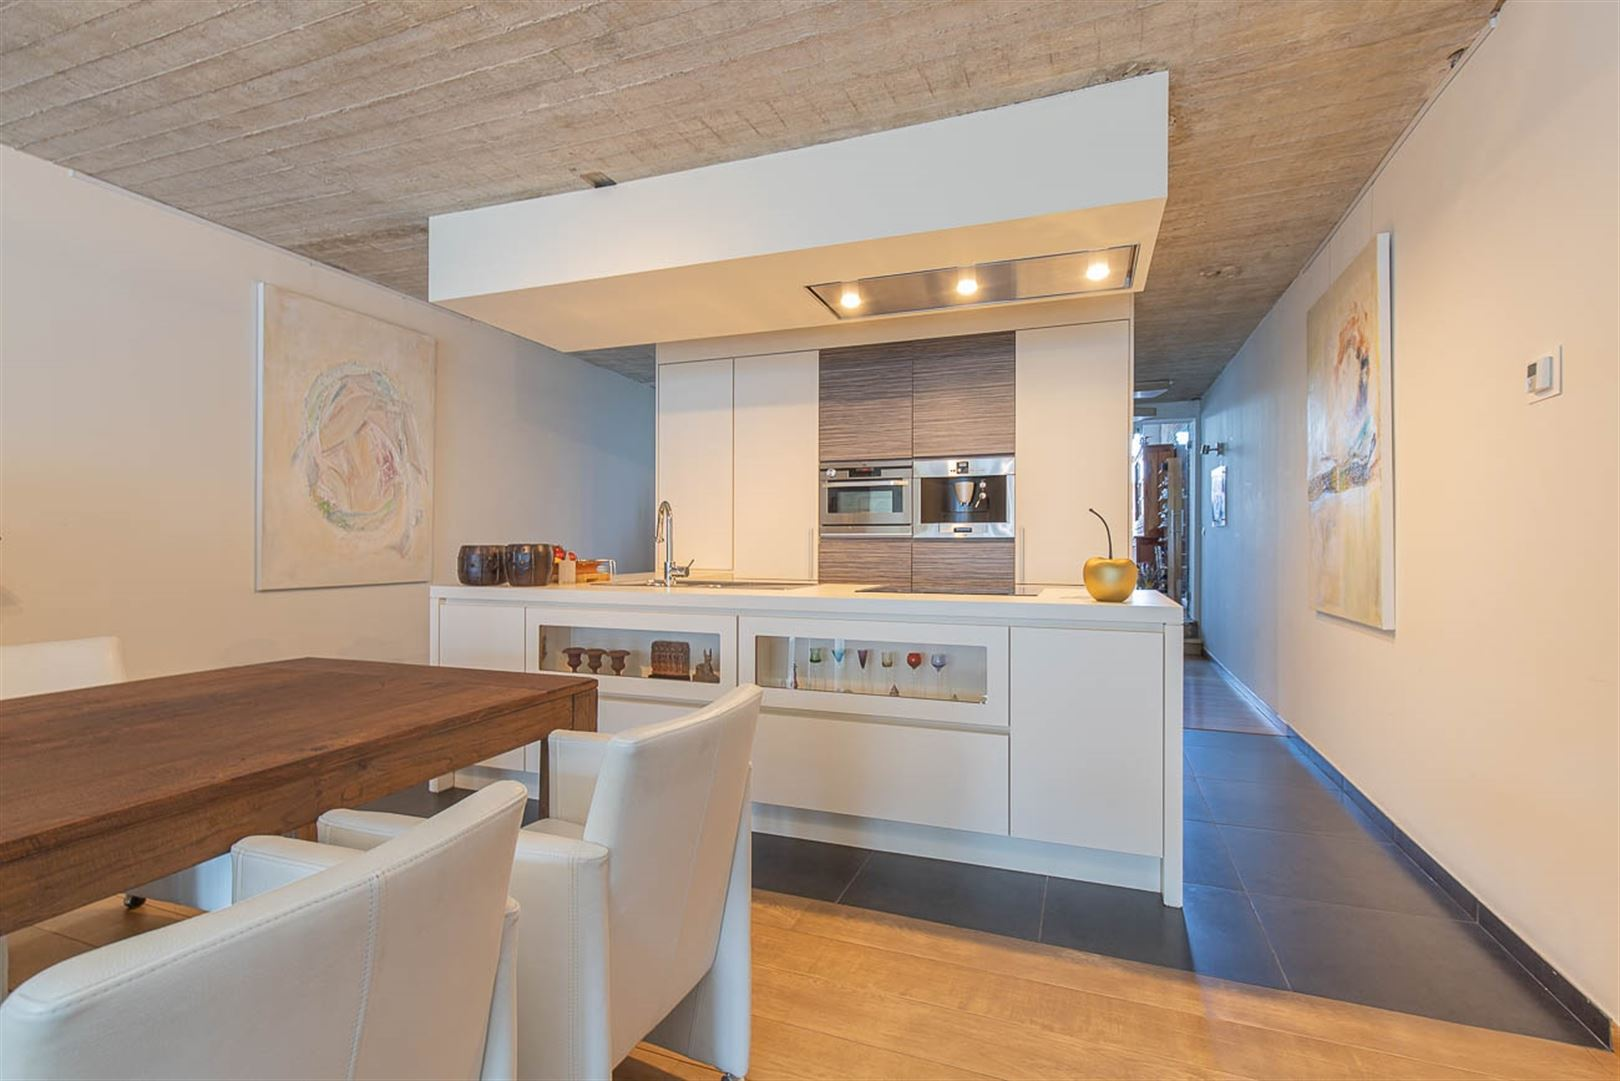 Foto 10 : Duplex/triplex te 9200 DENDERMONDE (België) - Prijs € 495.000